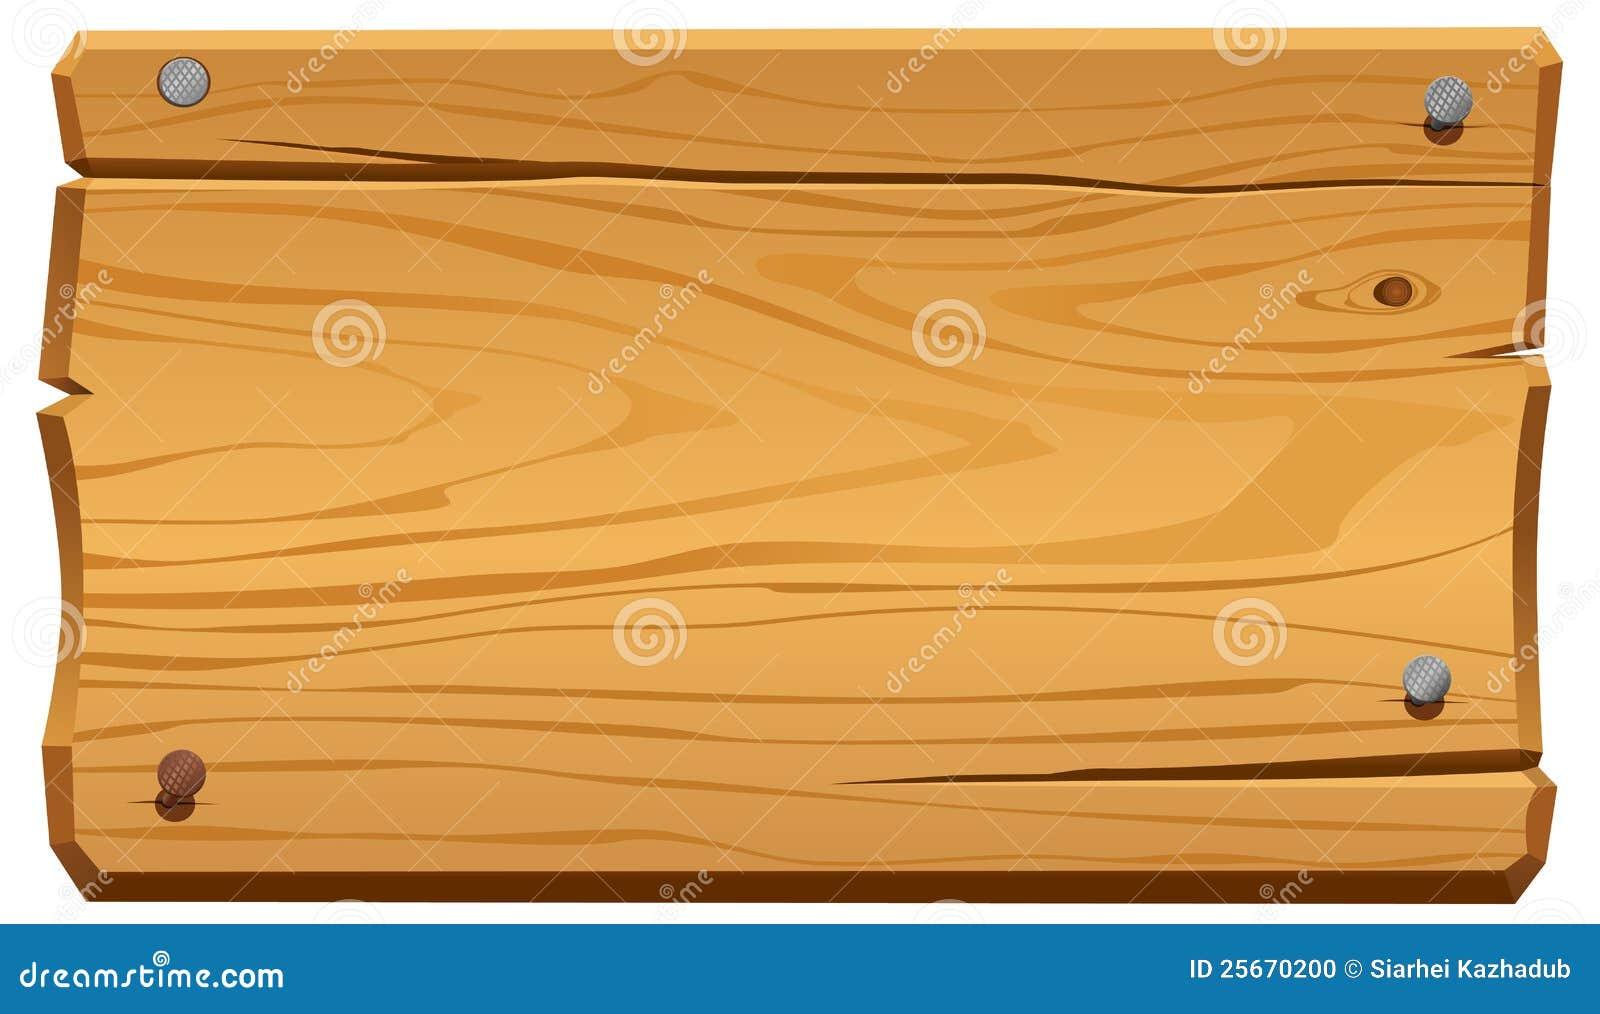 Wood frame stock vector. Illustration of board, crack - 25670200 for Wooden Picture Frame Clipart  150ifm